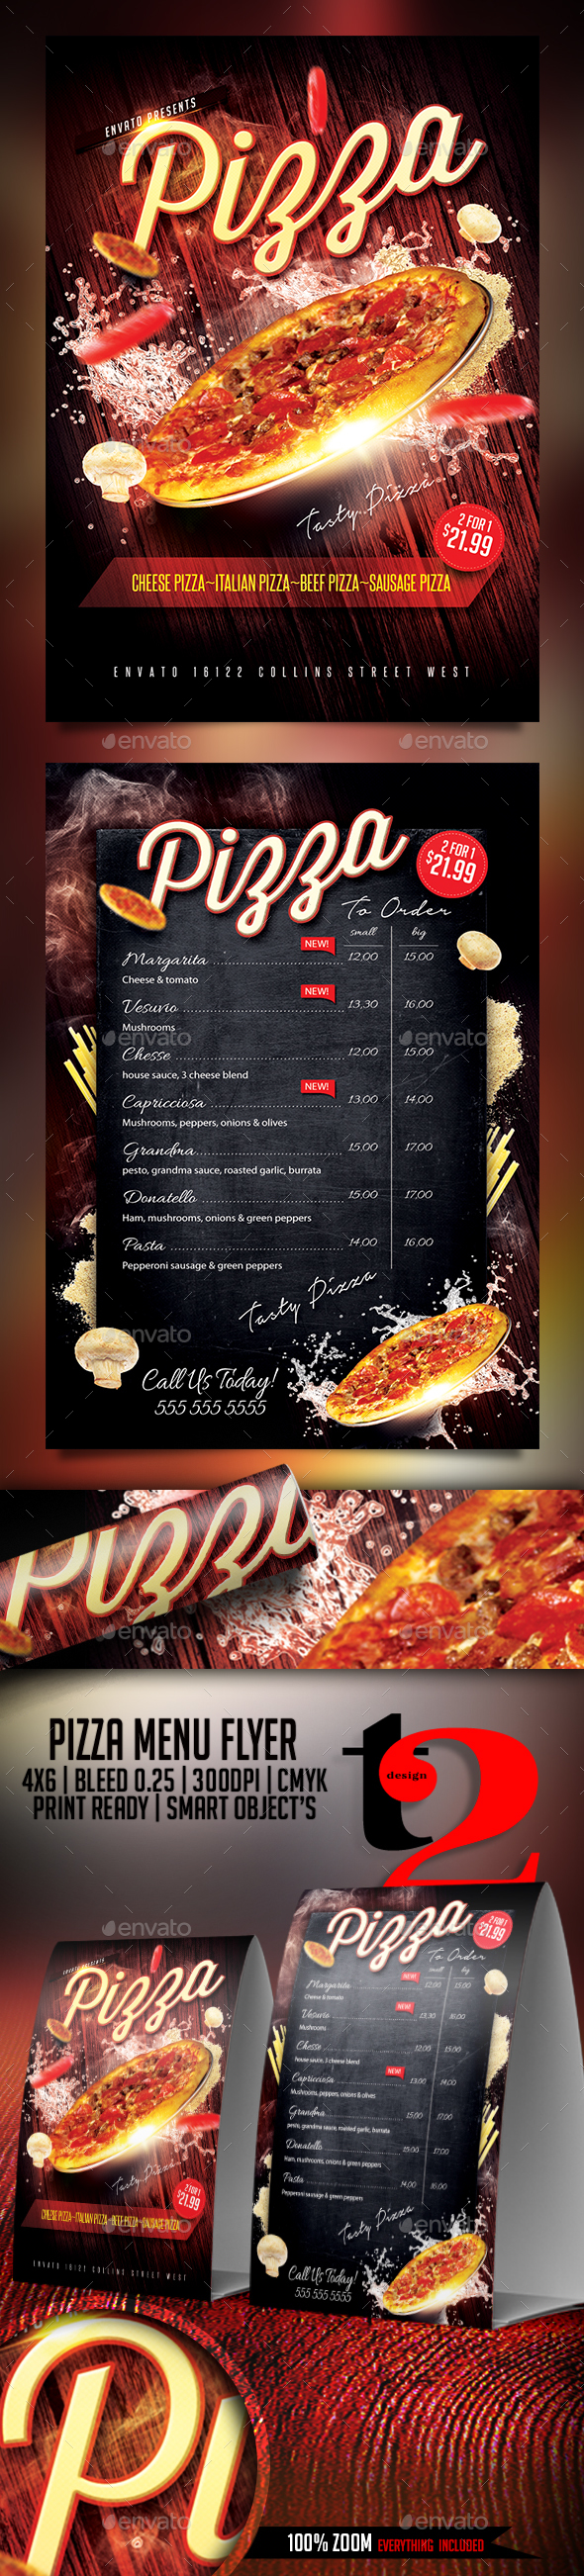 Pizza Menu Flyer Template - Restaurant Flyers